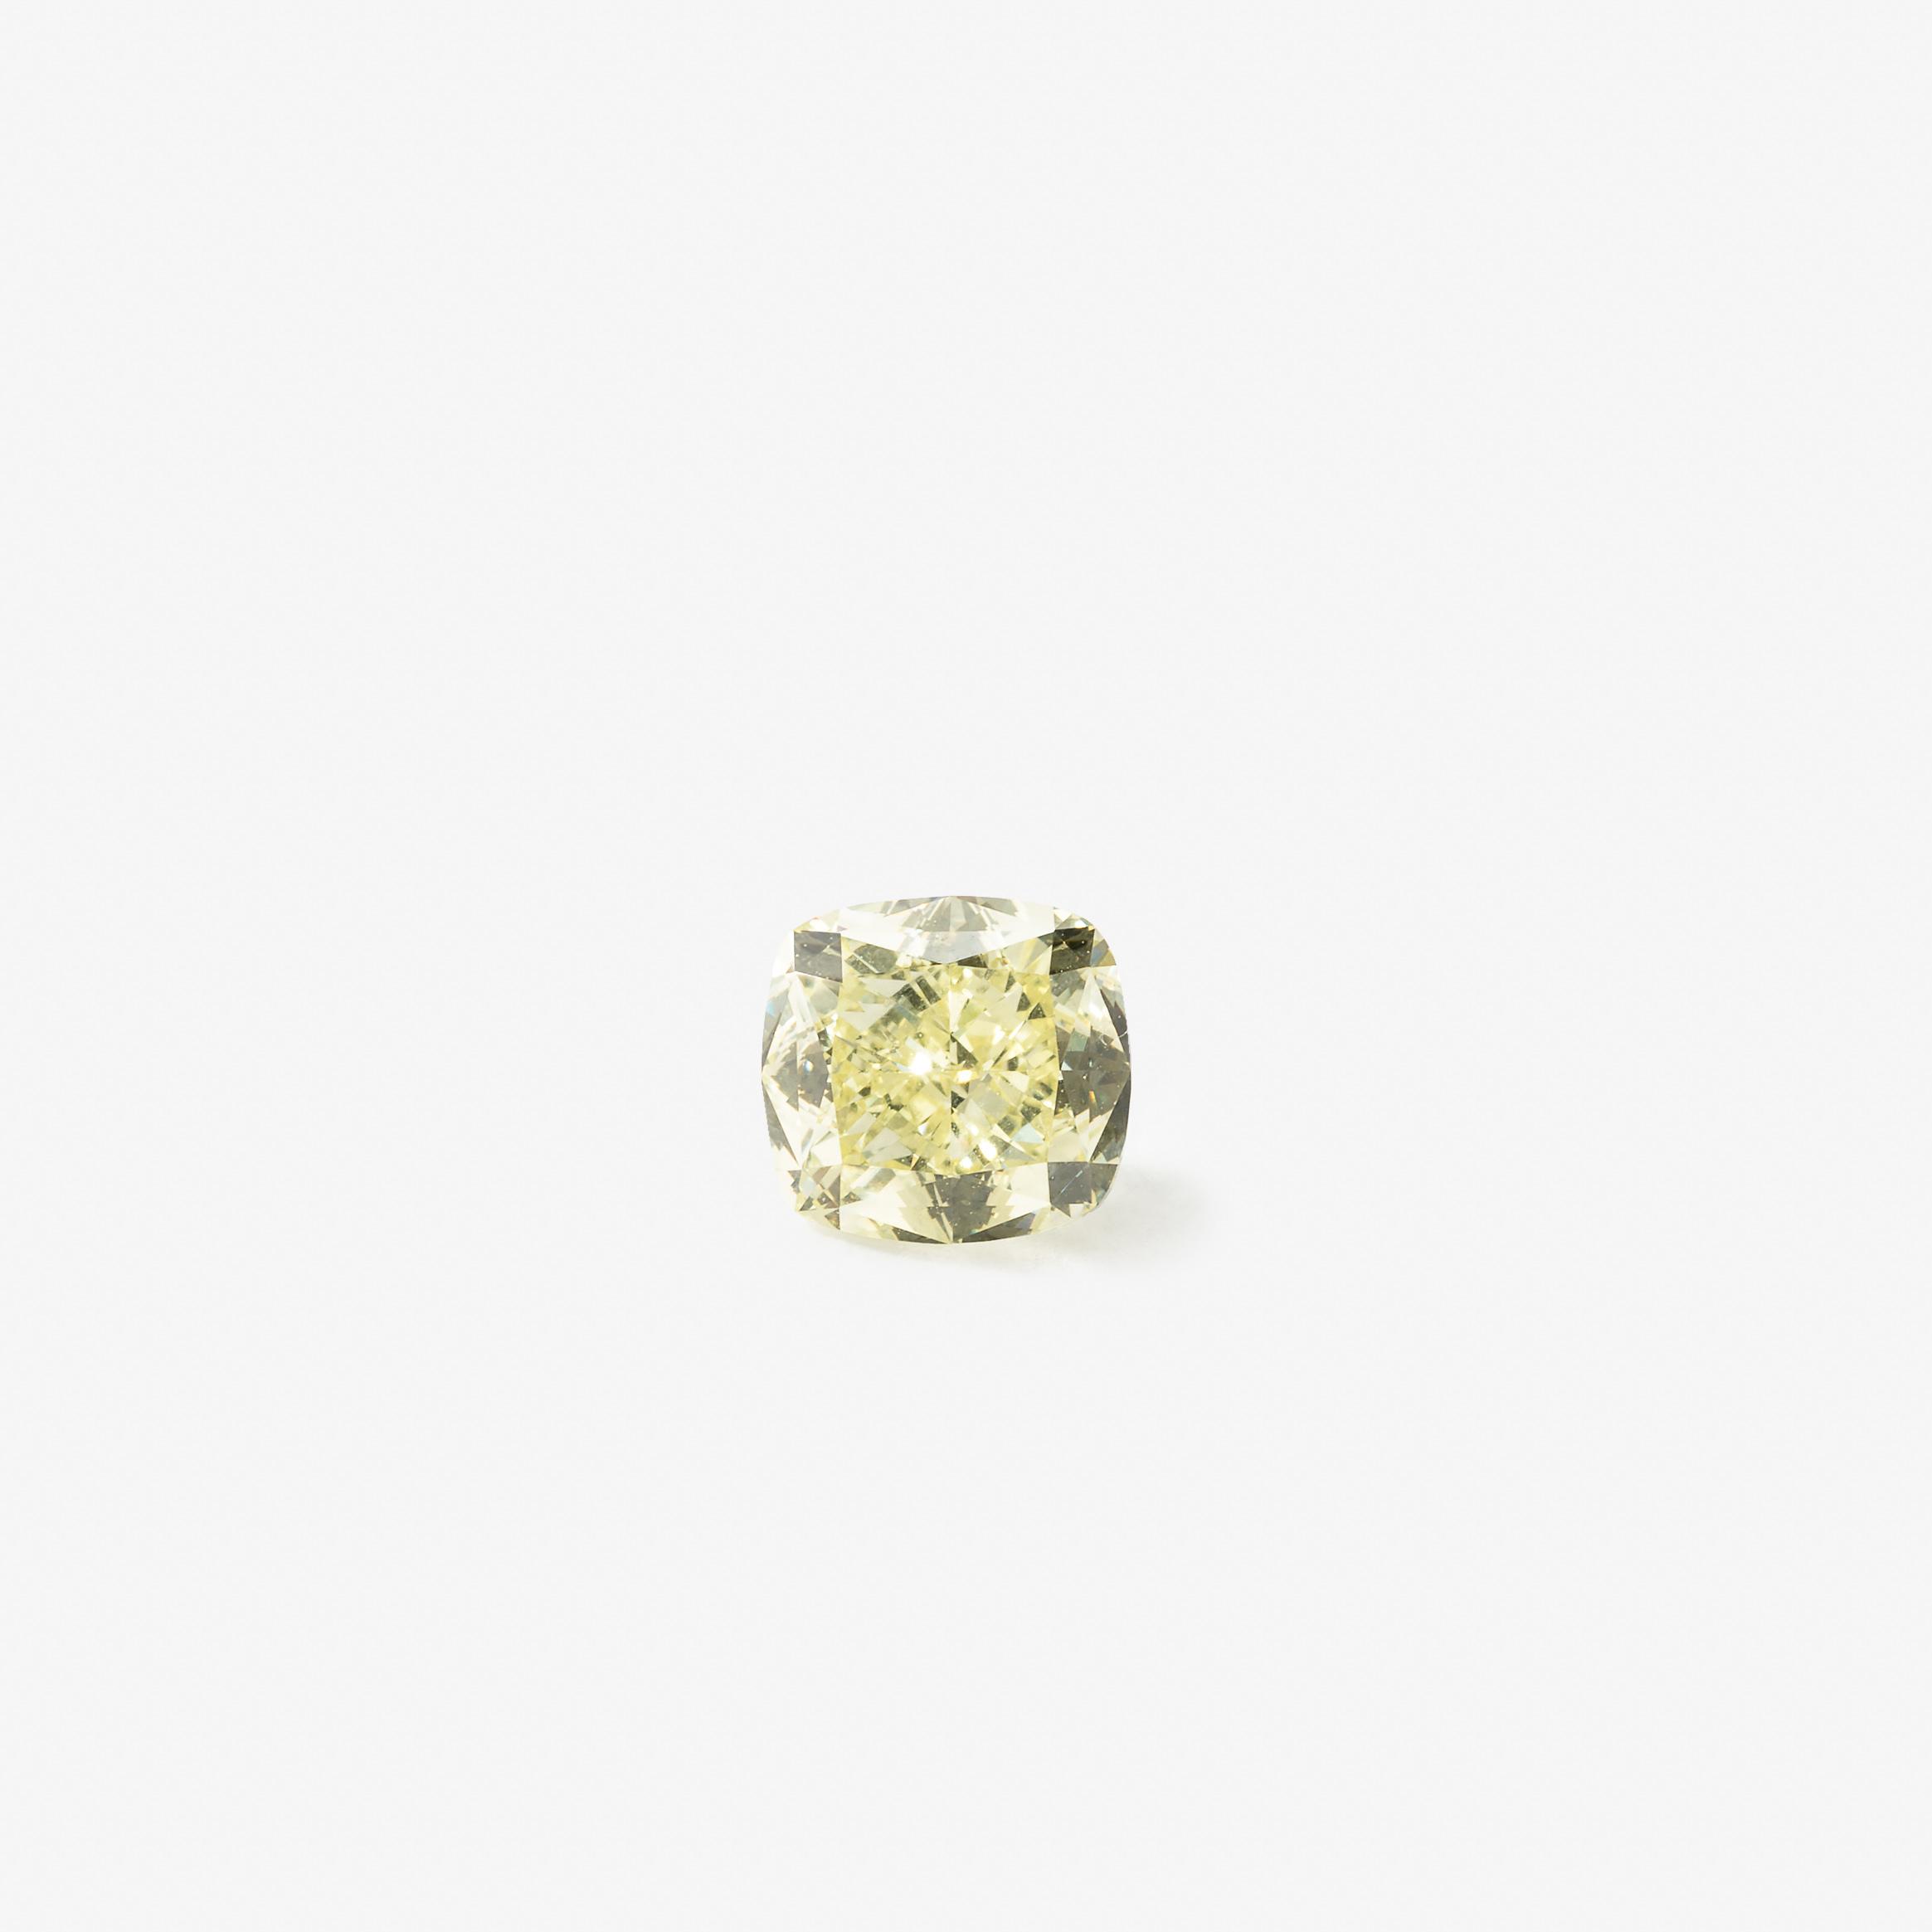 Cushion Cut-Diamant von 1,39 ct GIA-Zertifikat: Fancy Light Yellow, Natural Even, IF, numbered GIA 2173378445, 18. November 2015 Schätzpreis: 9.000-12.000 Euro